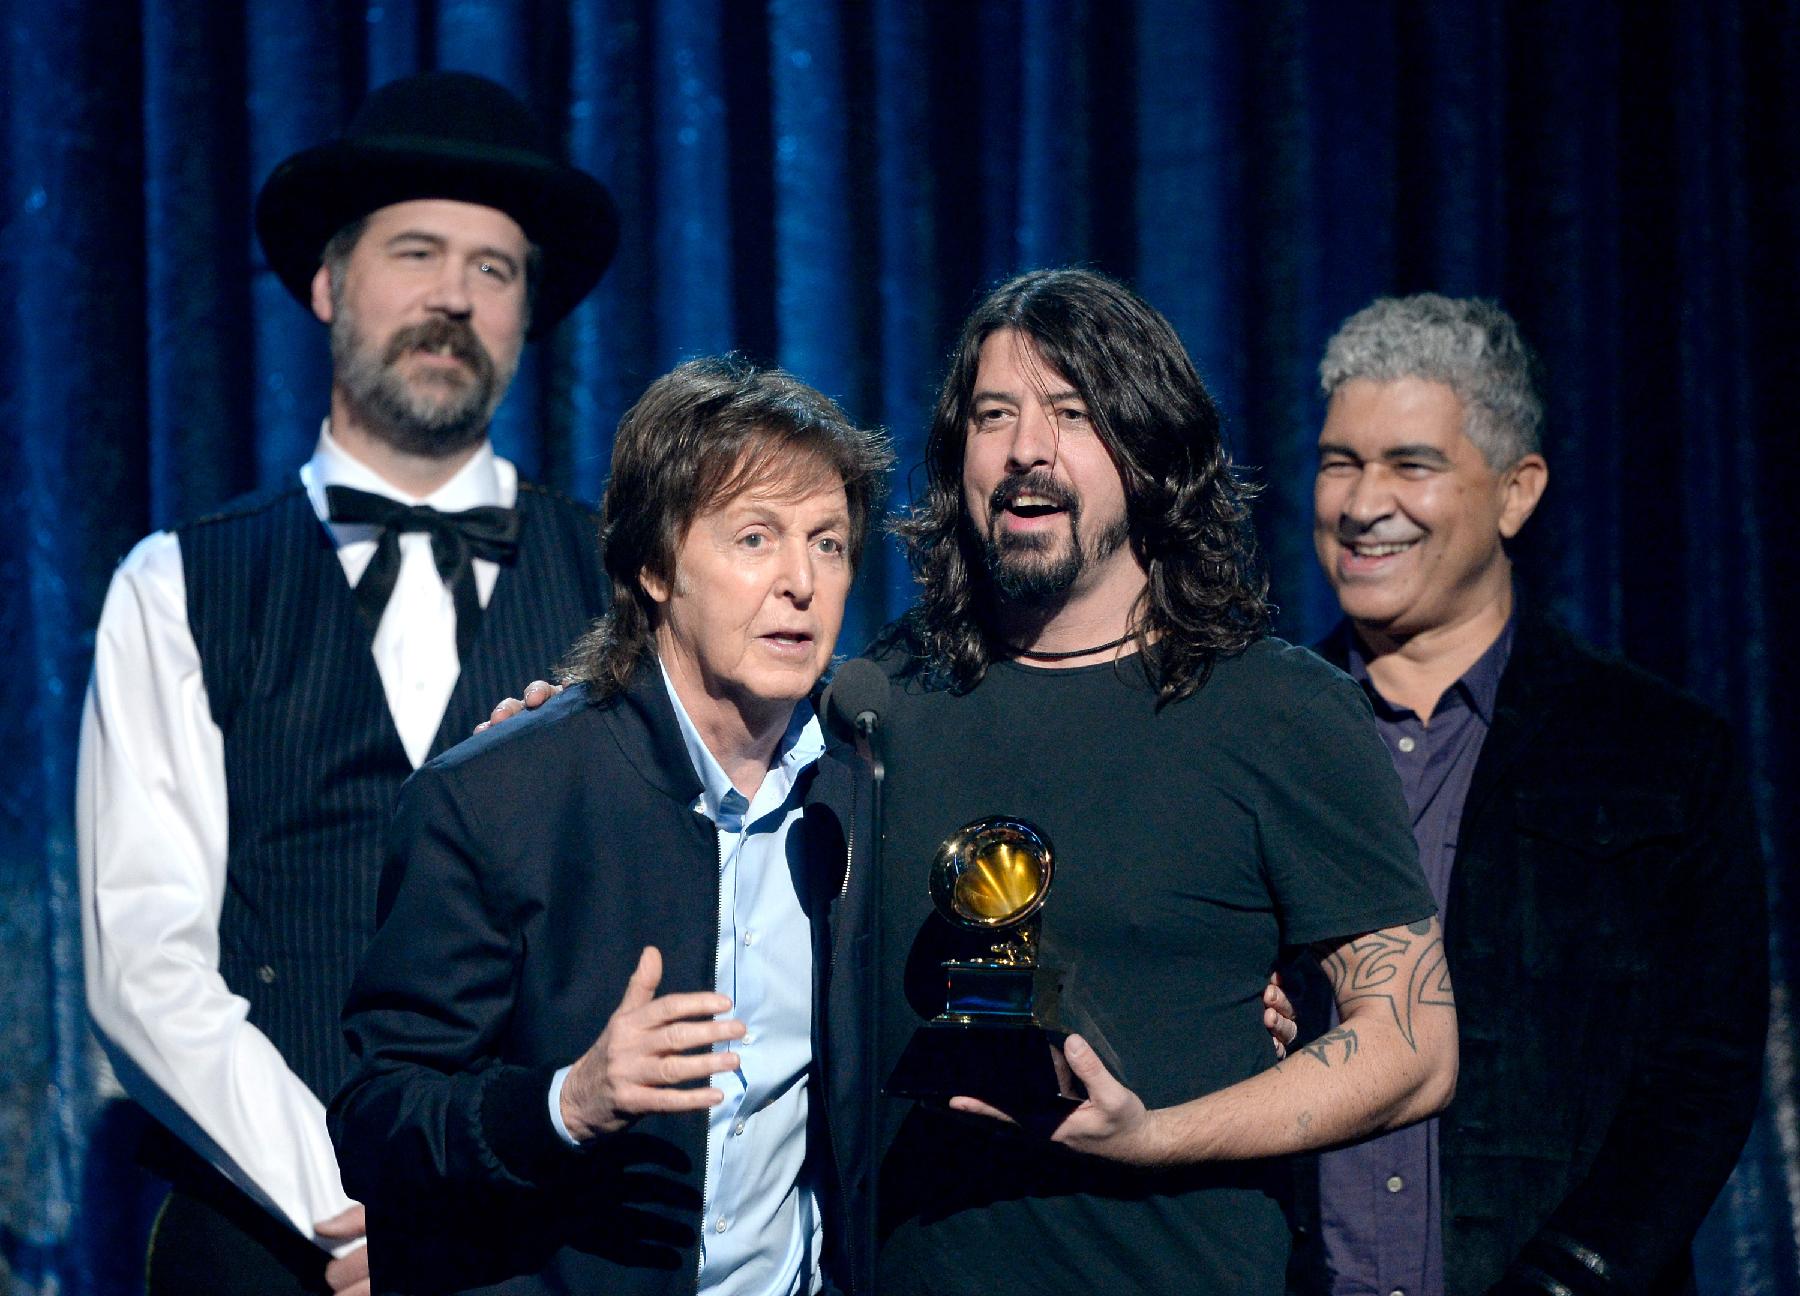 Paul McCartney Recalls Magic of Nirvana Team-Up Backstage at Grammys